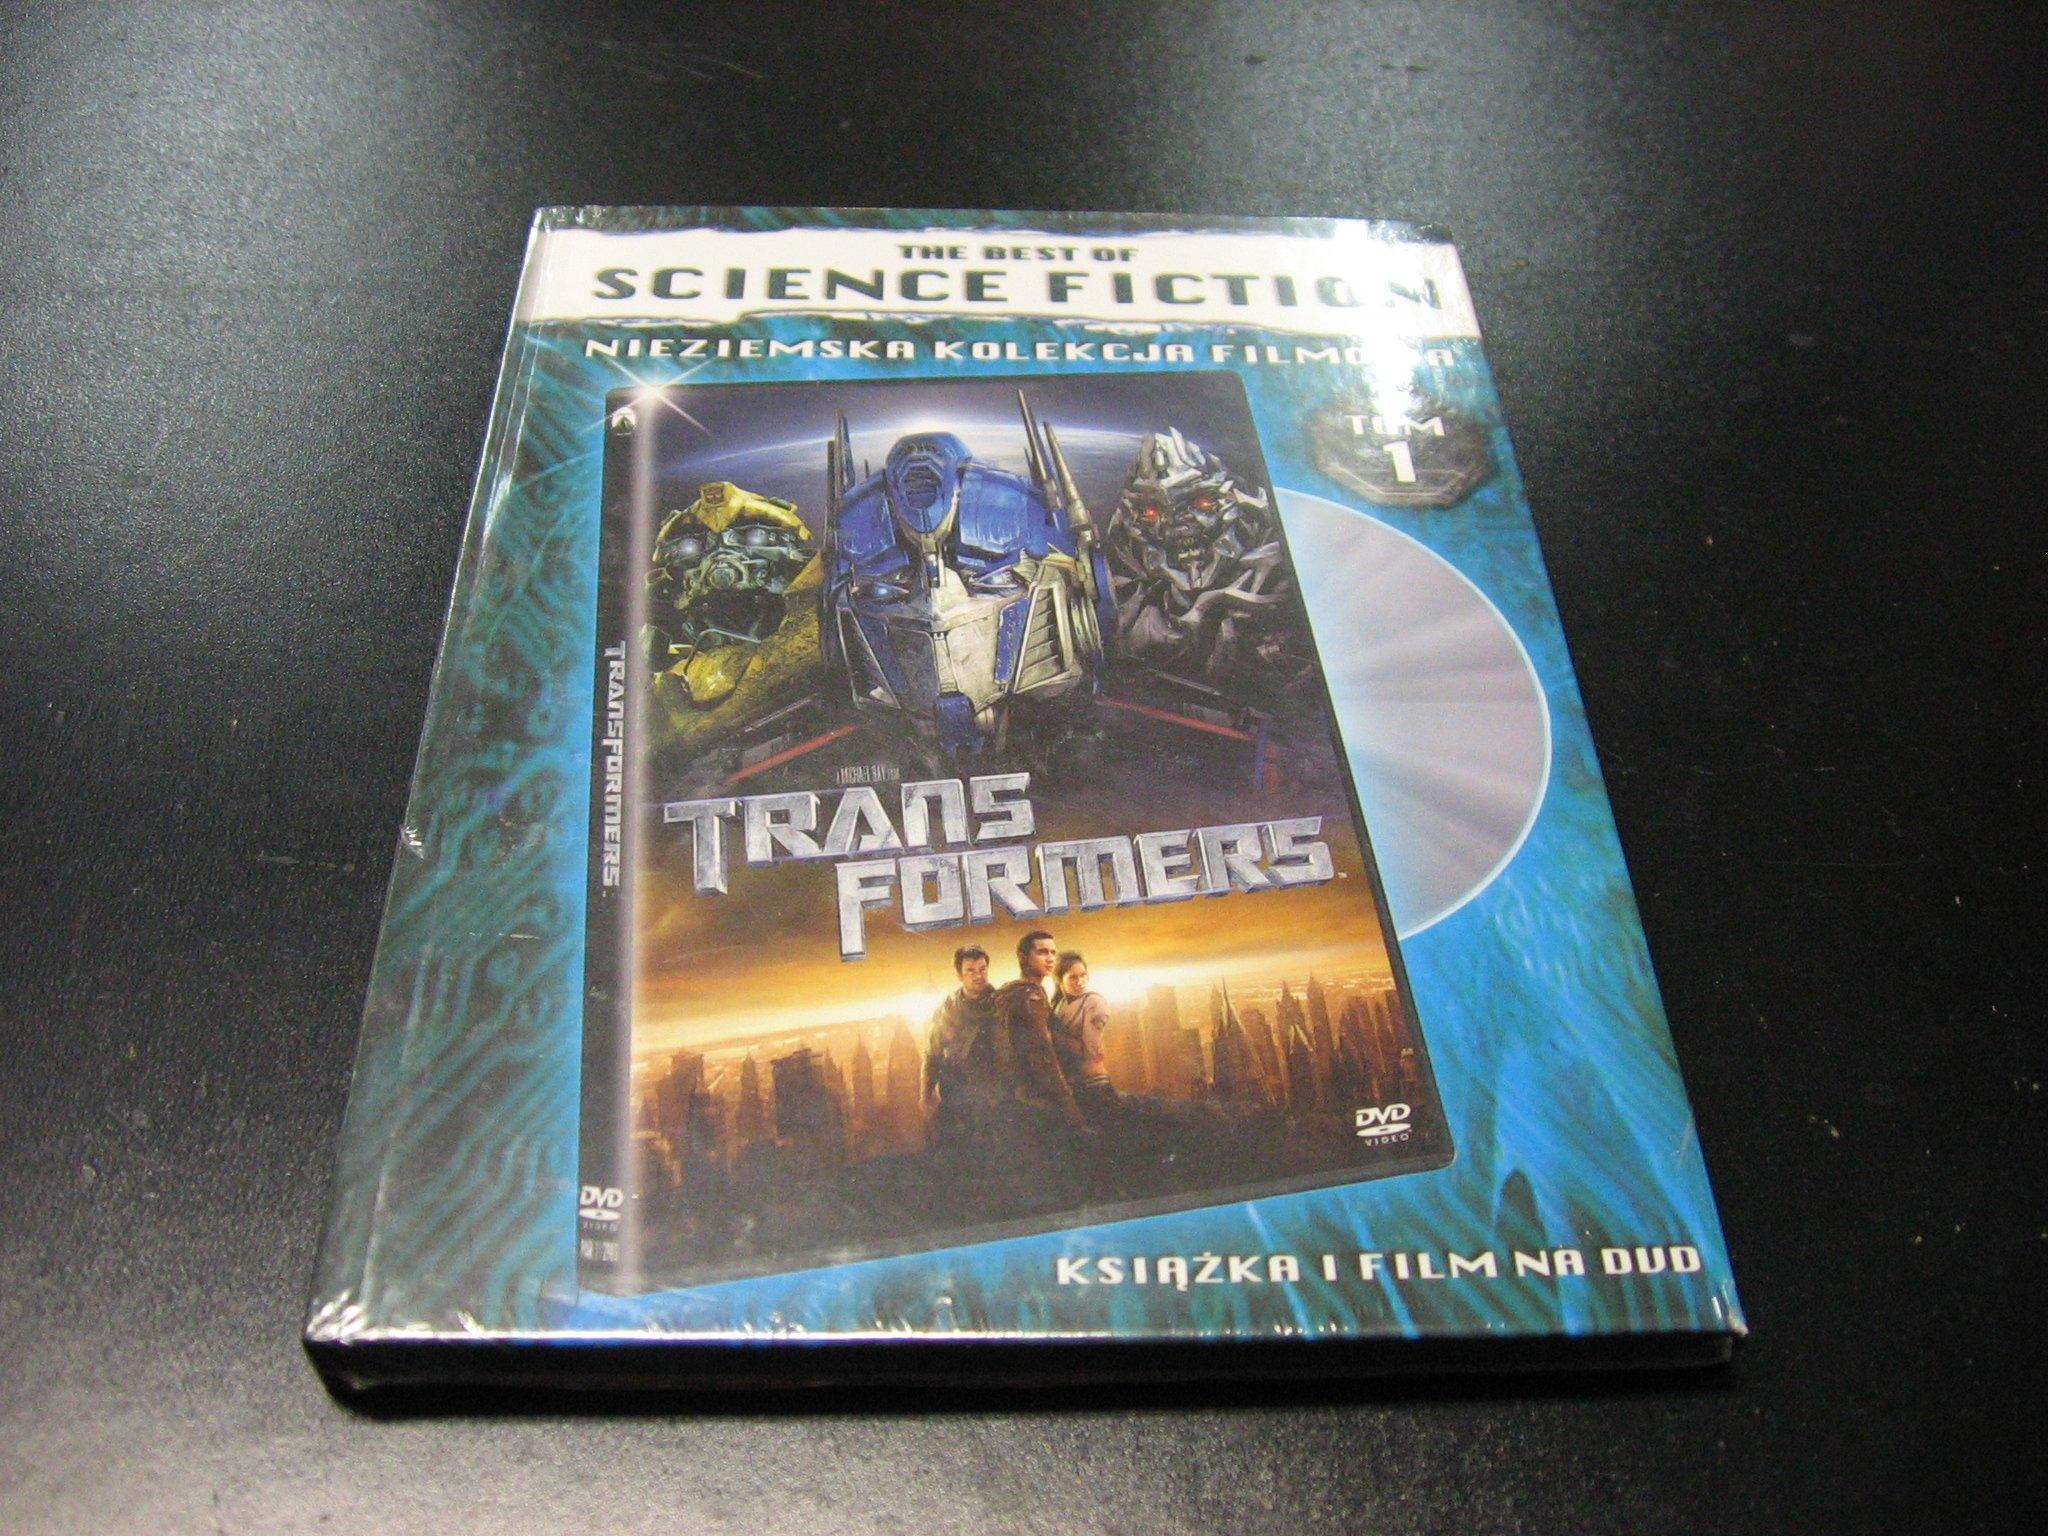 TRANSFORMERS `````````` DVD ```````````` Opole